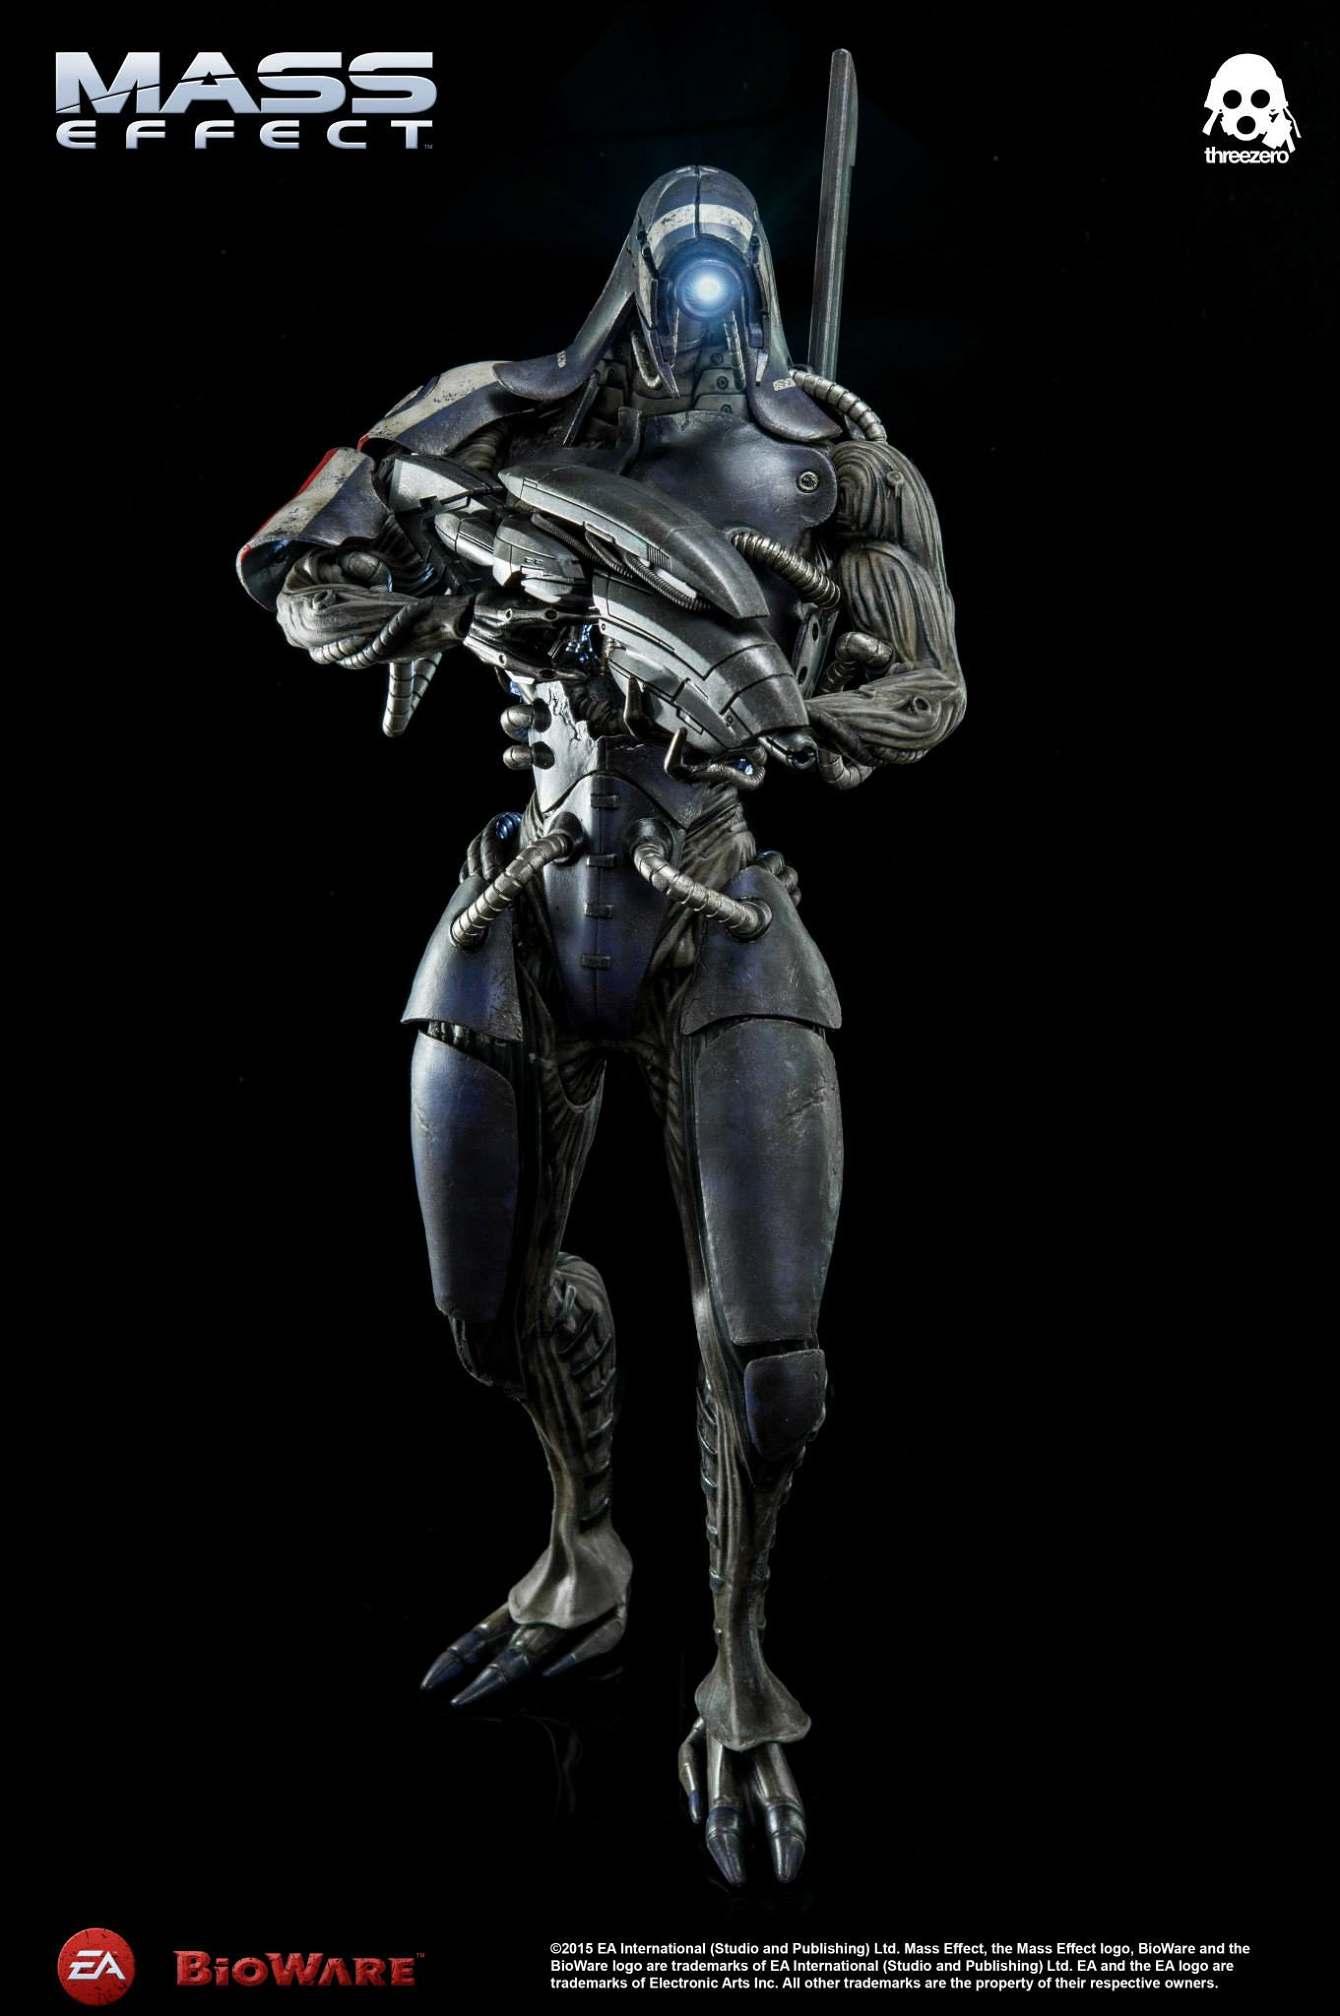 ThreeZero-Bioware-video-game-Legion-Mass-Effect-figure-6_1340_c.jpg